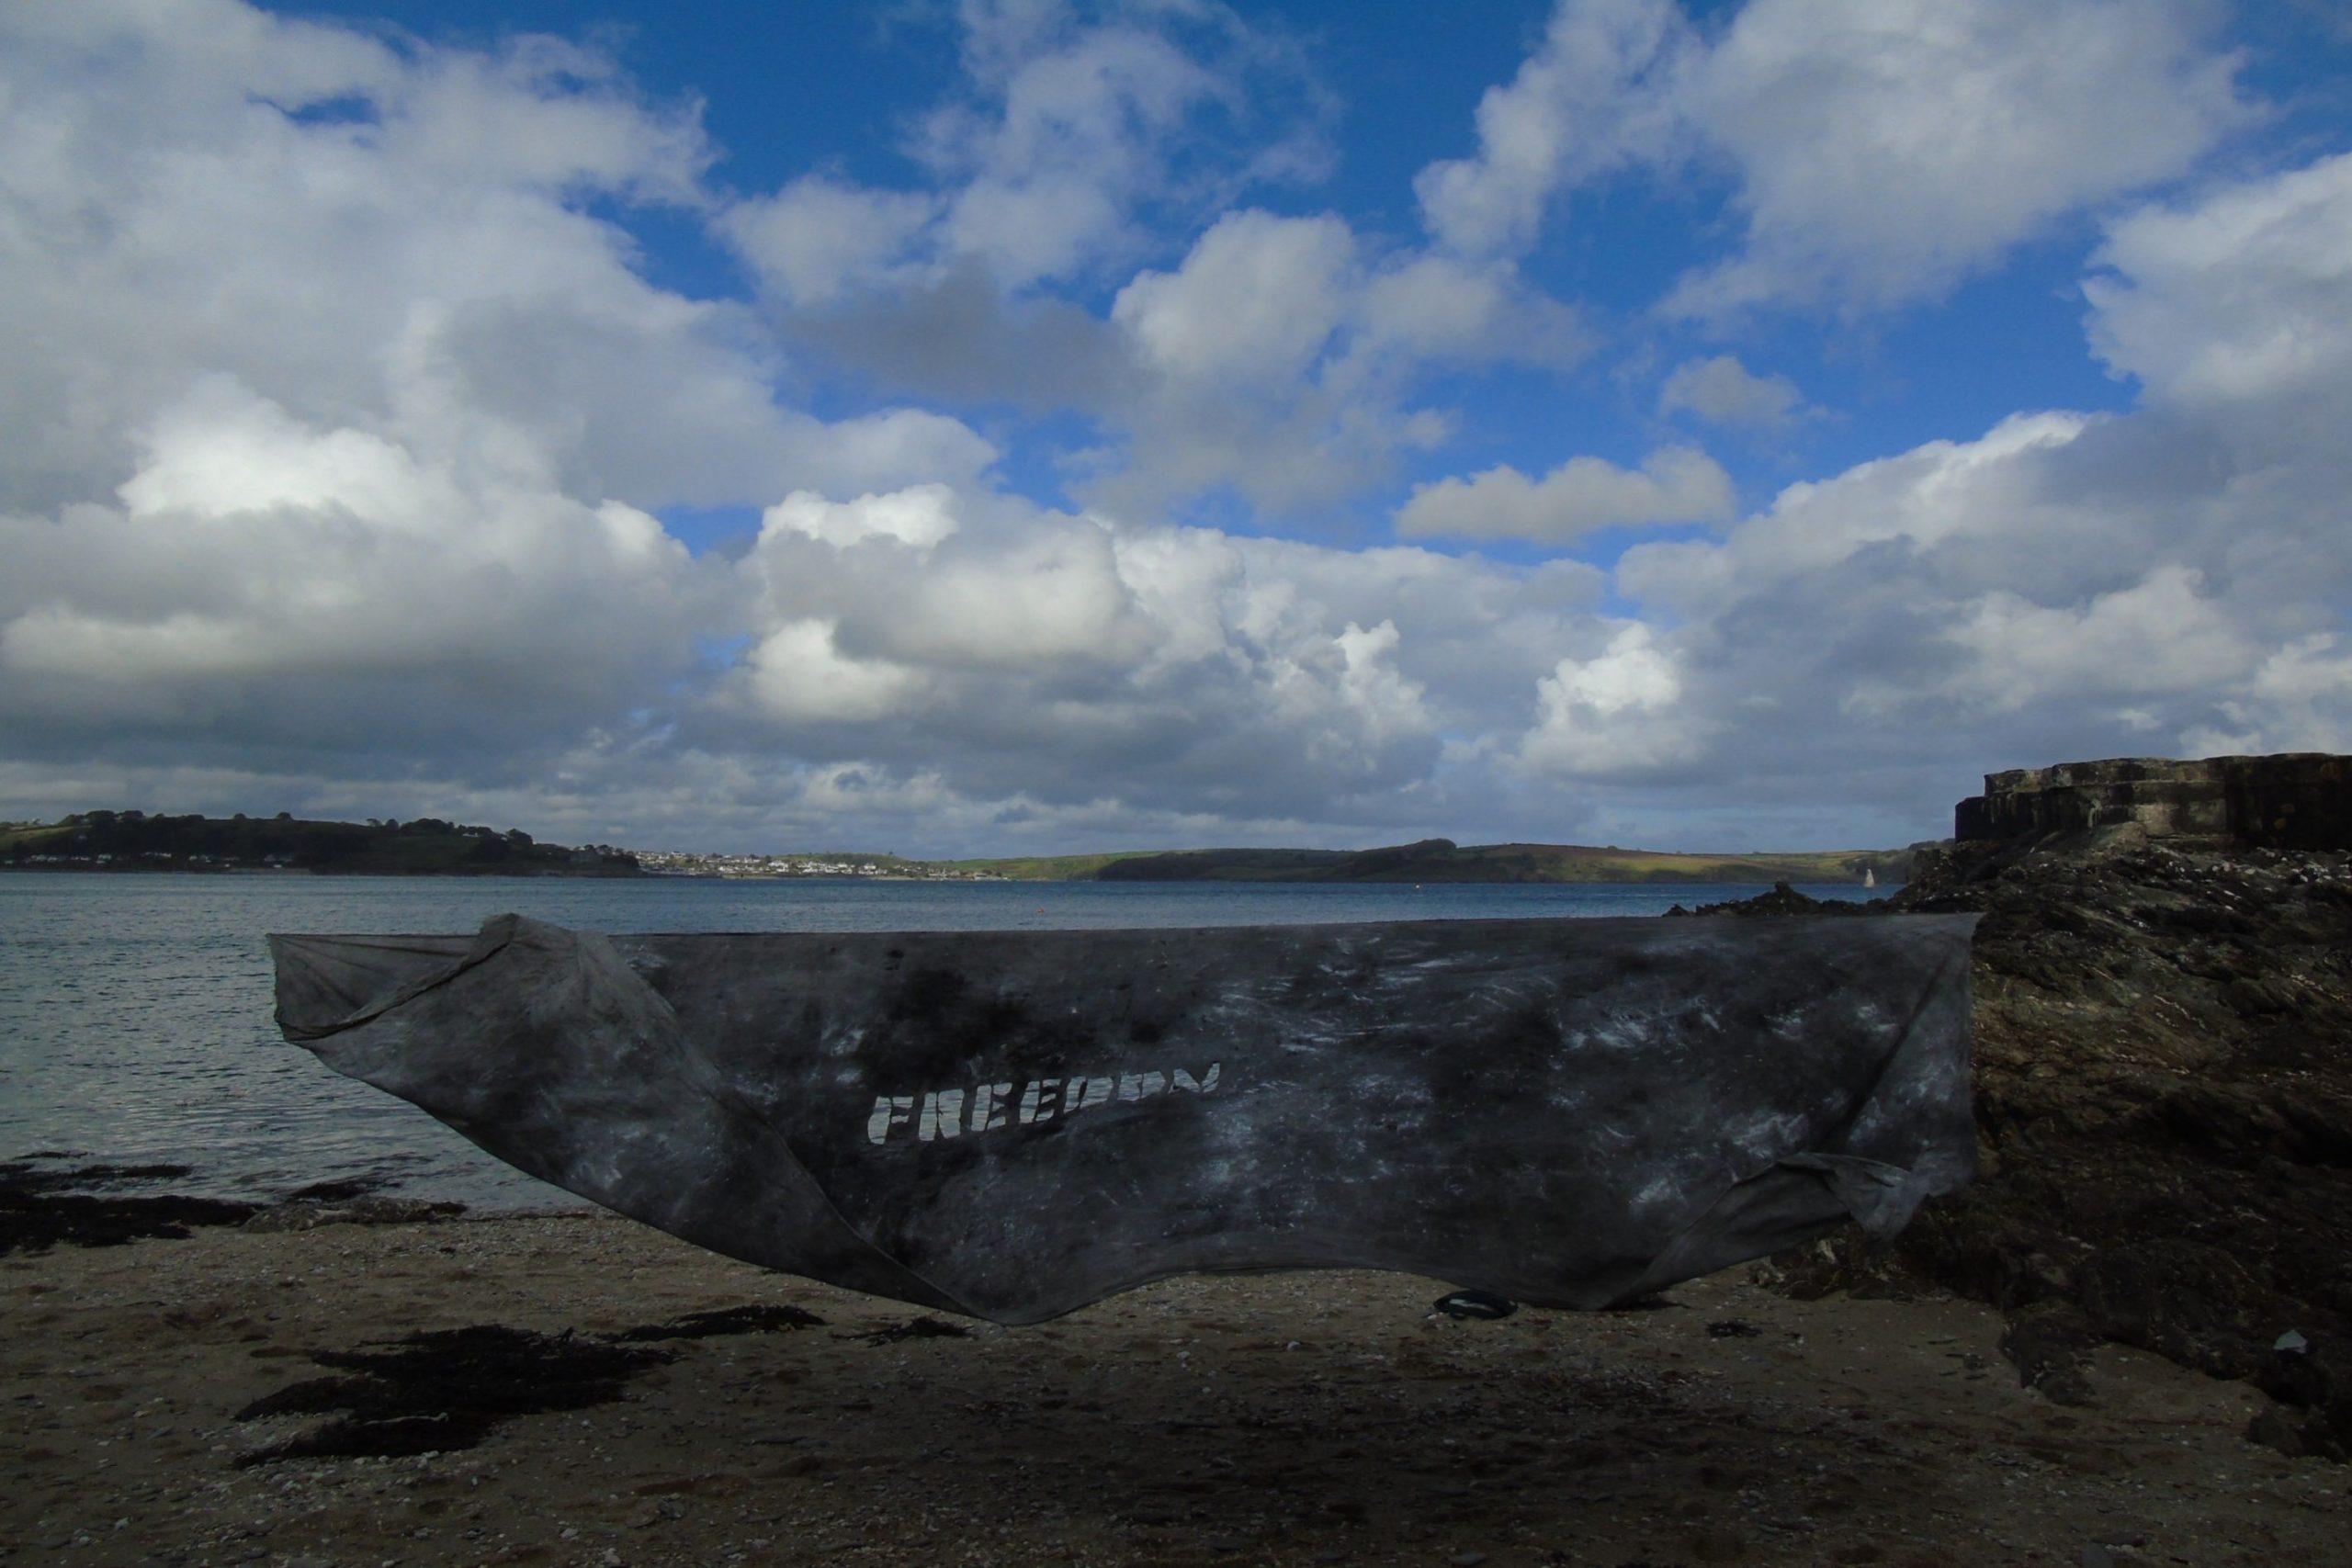 FREEDOM Monochrome Sea Painting 1.jpg